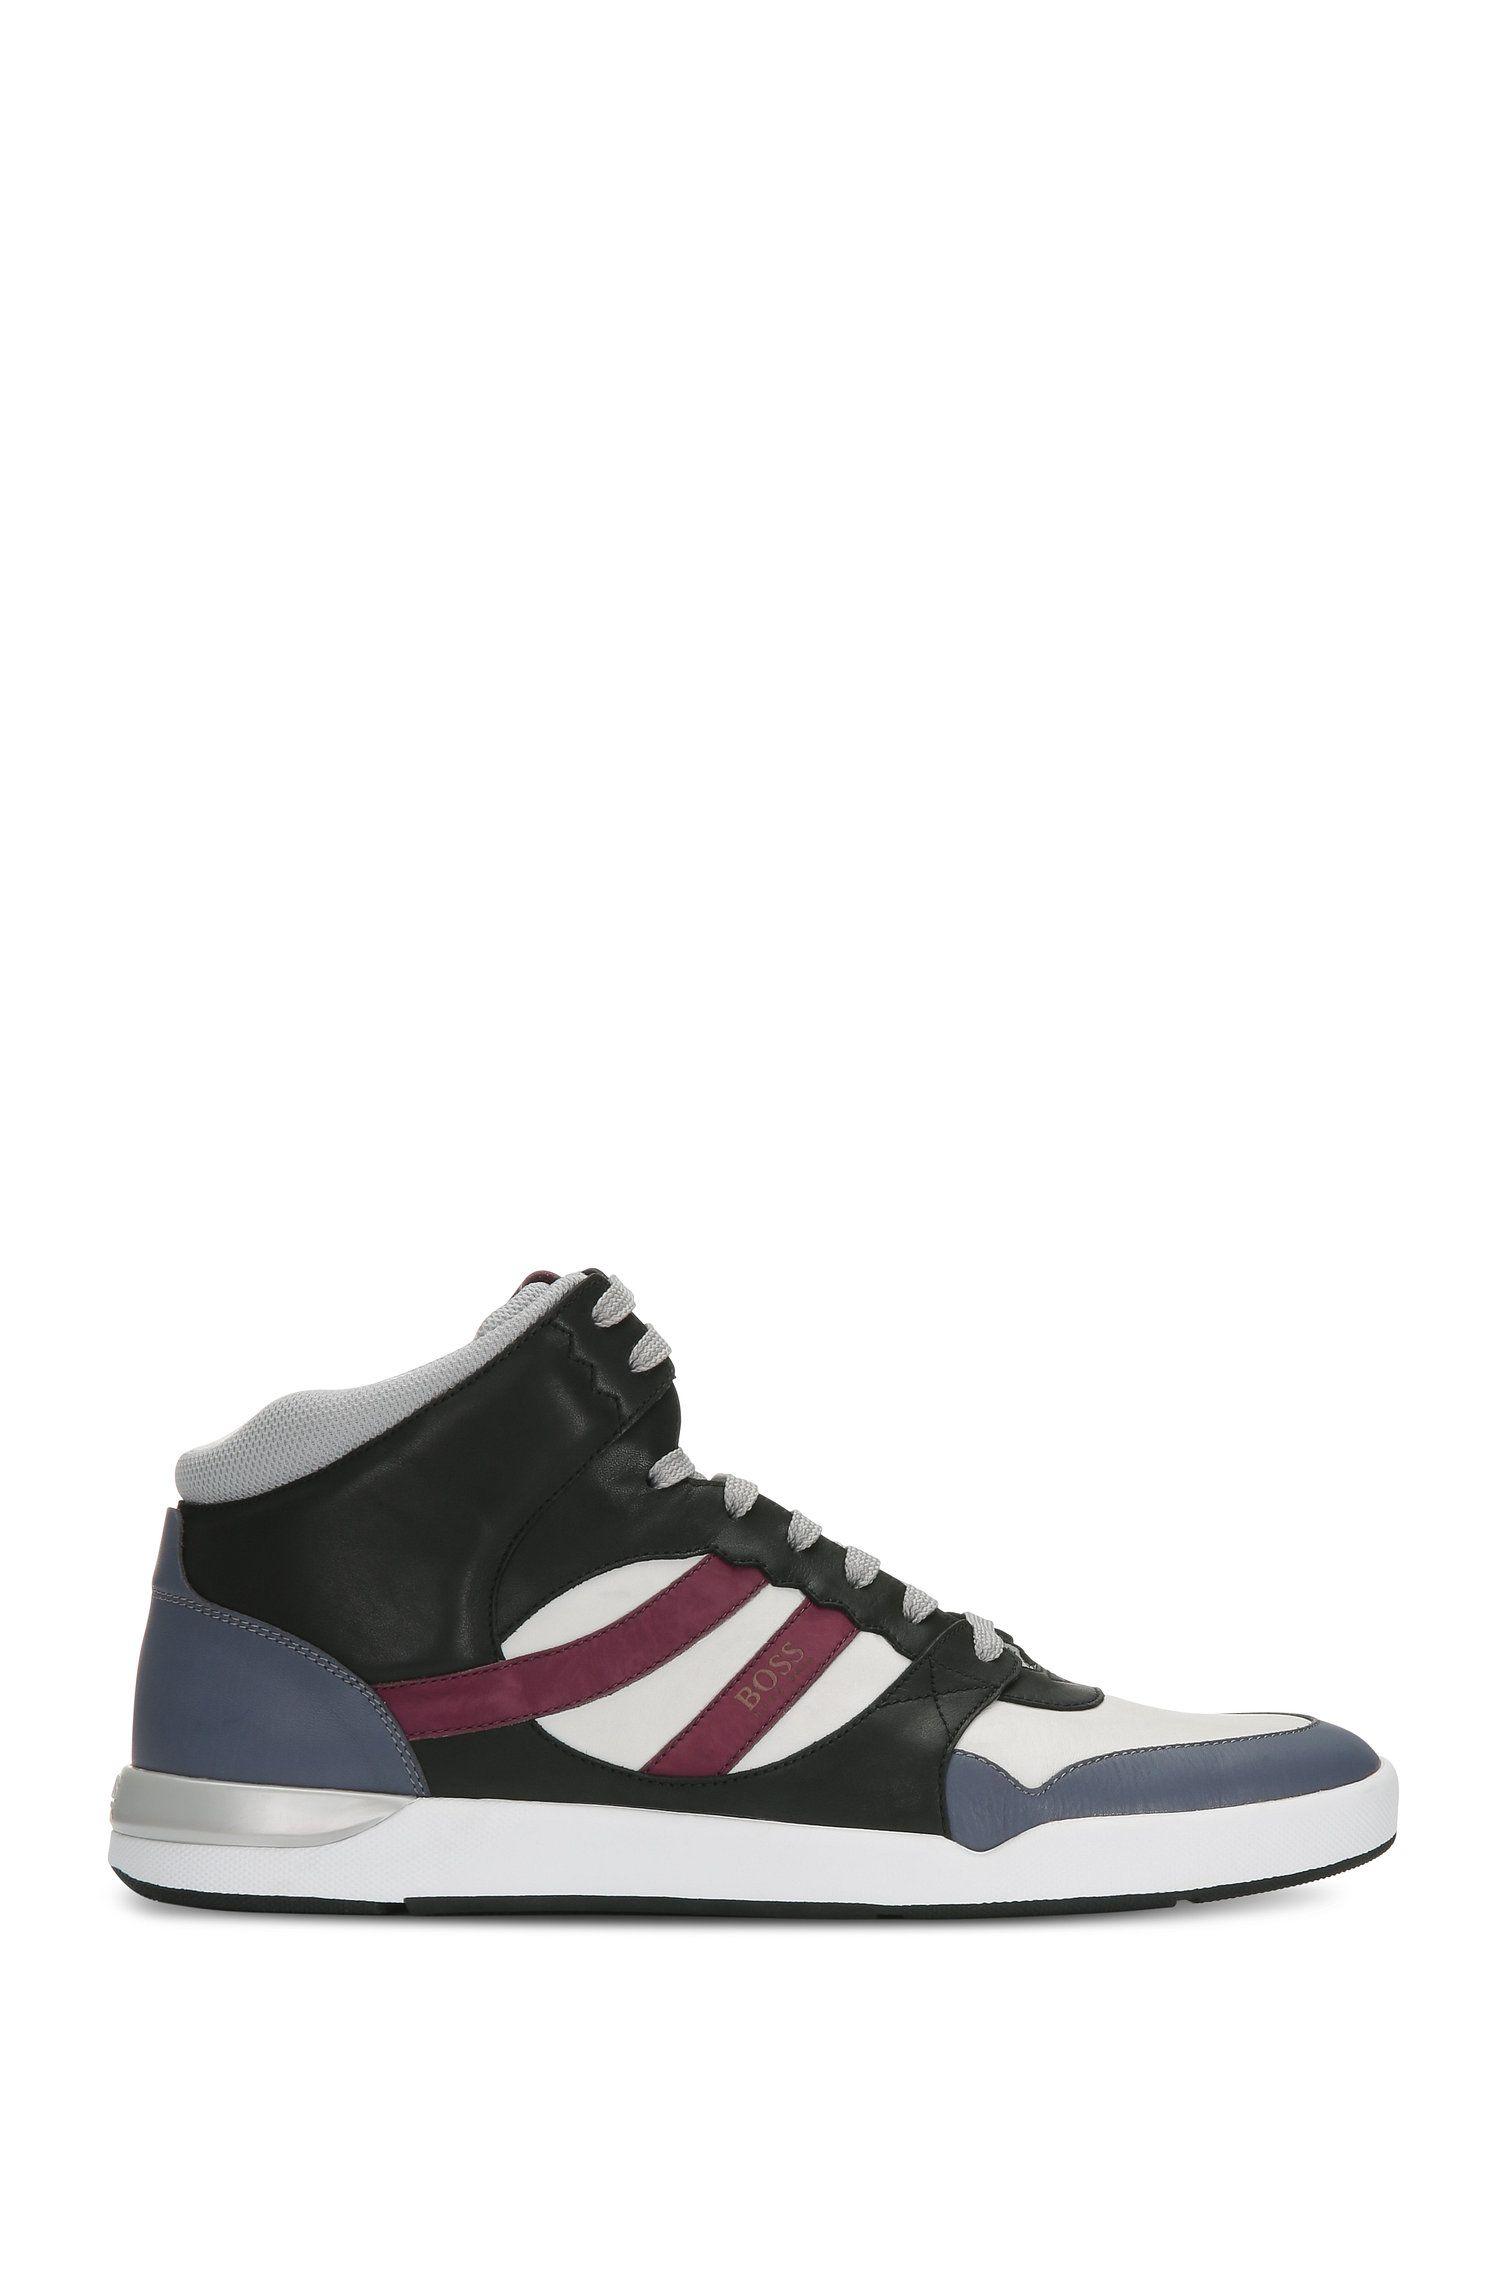 Leather High Top Sneaker | Stillnes Hito ltws